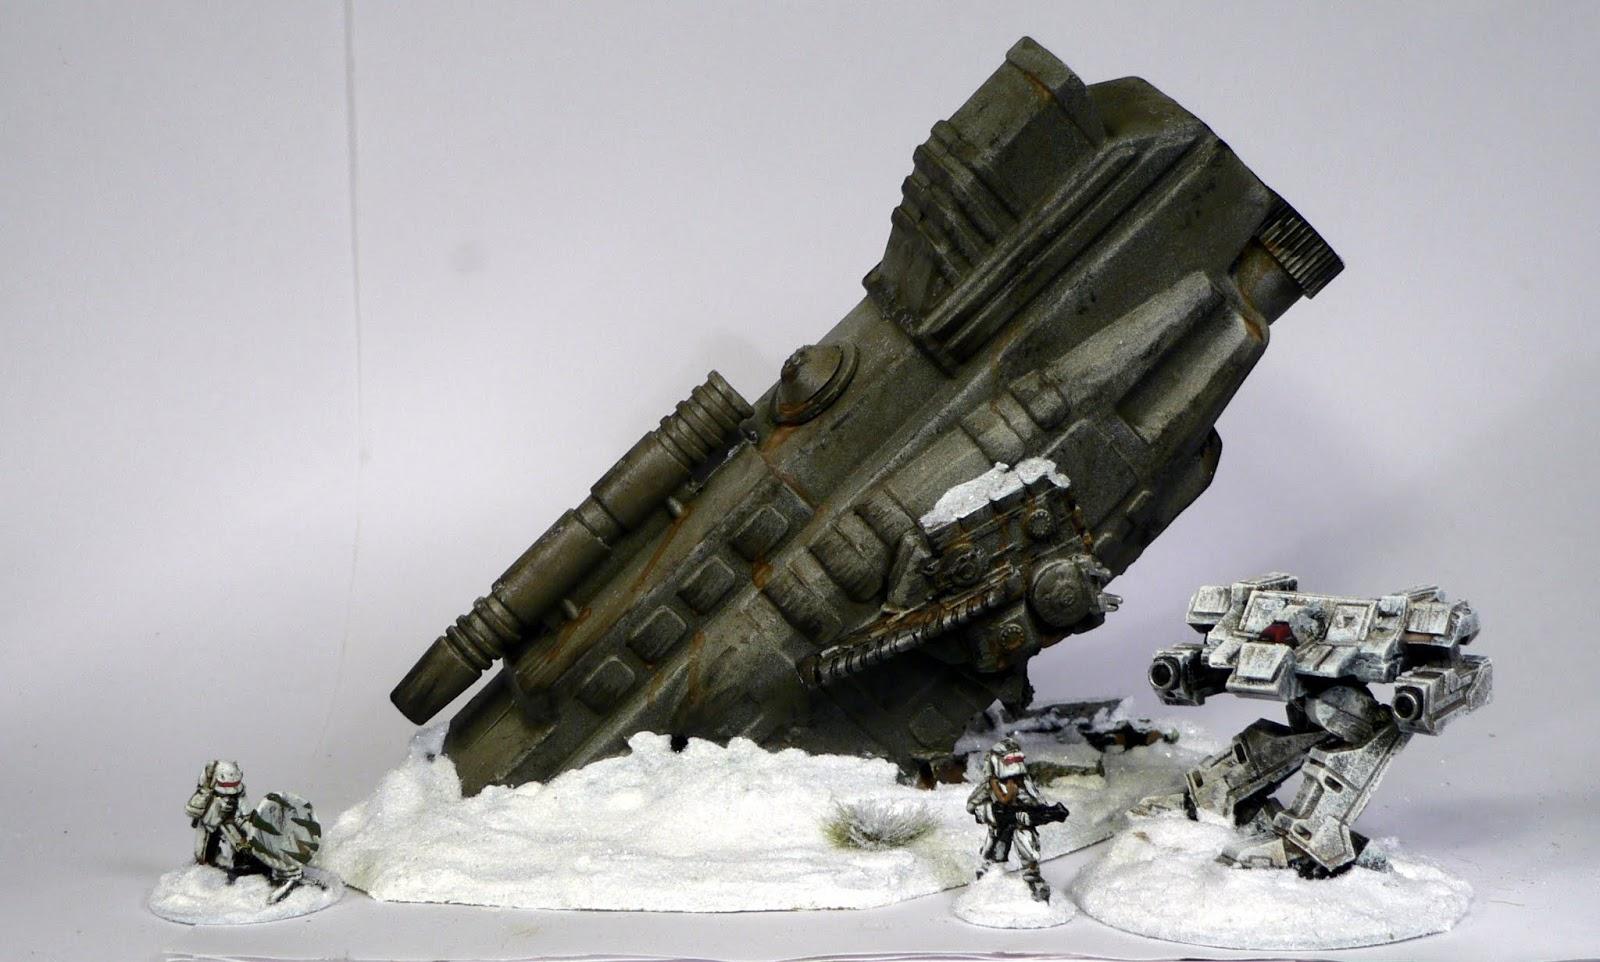 space ship crash - photo #23